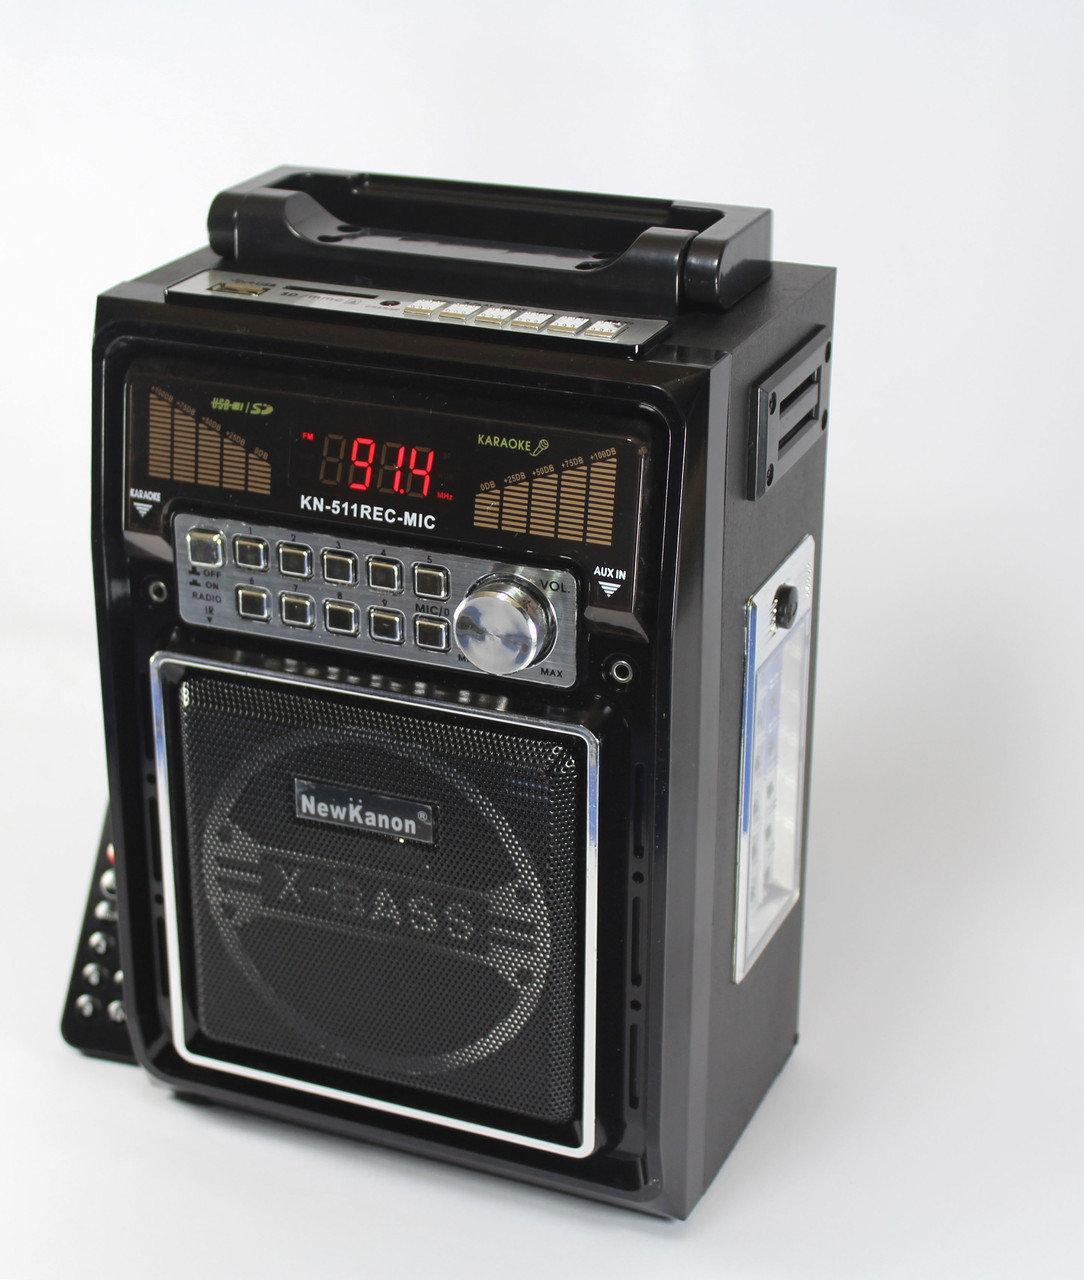 FM-приемники | Радио | Портативное радио | Портативный радиоприемник KN-511